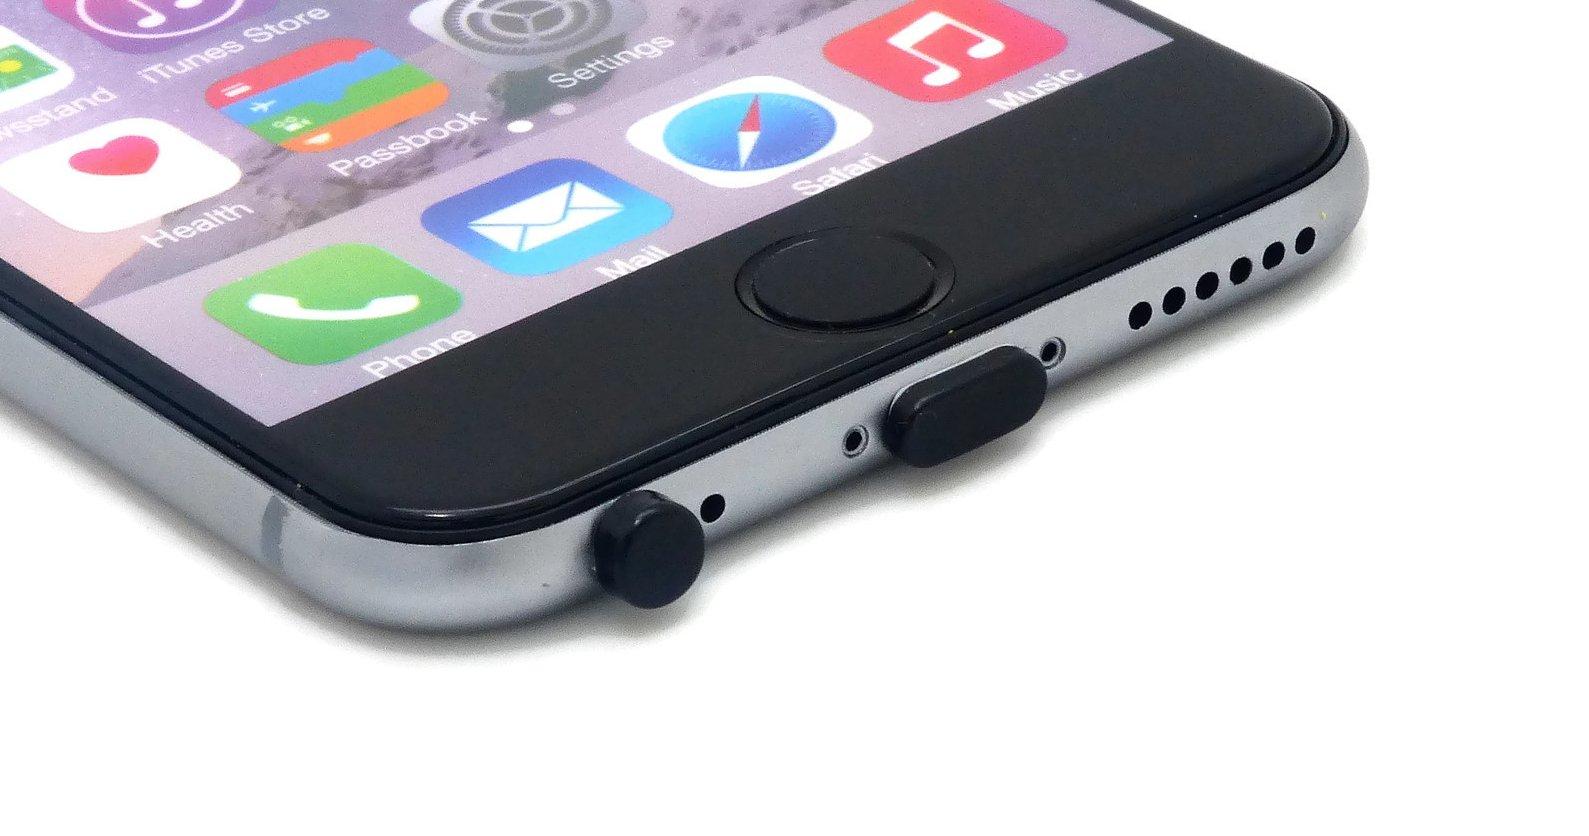 dust plugs for ipad mini